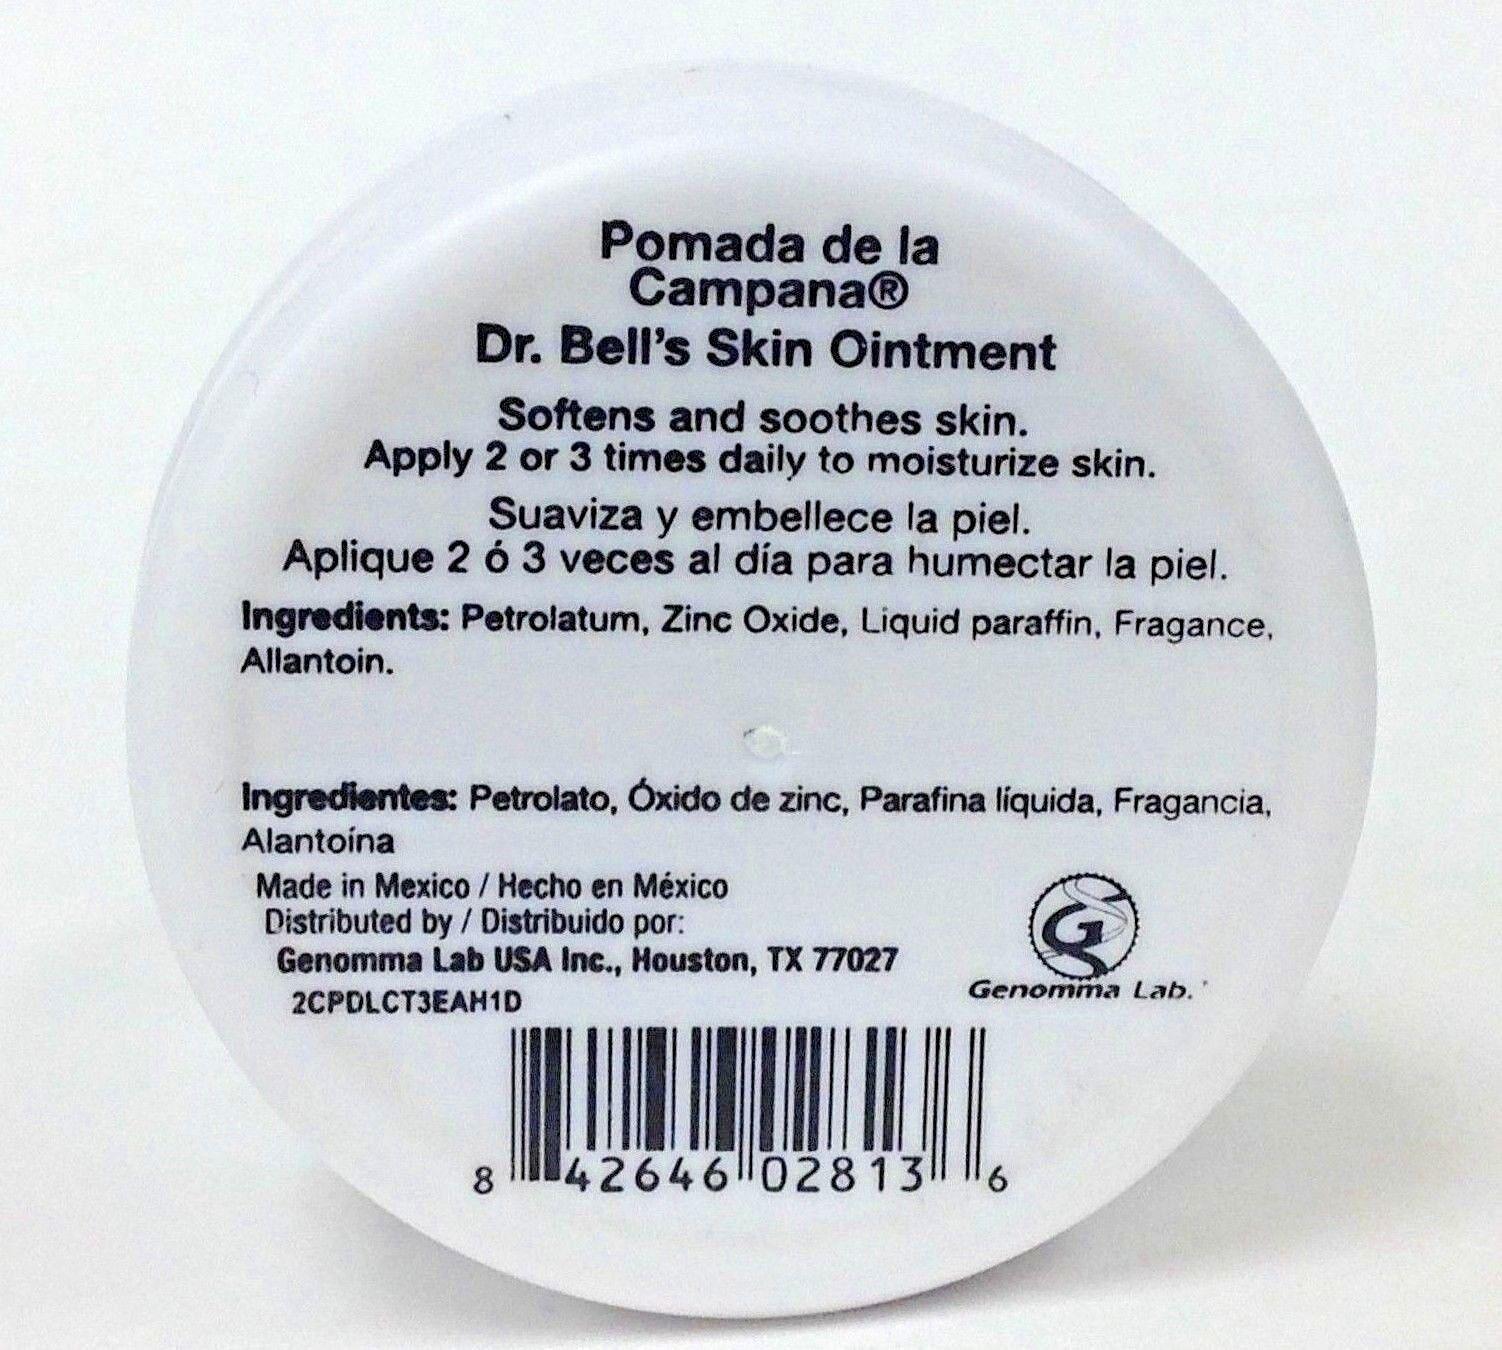 28 Dr Bell Pomada De La Campana Skin Ointment 12 Oz Each Jl 5030 Ebay